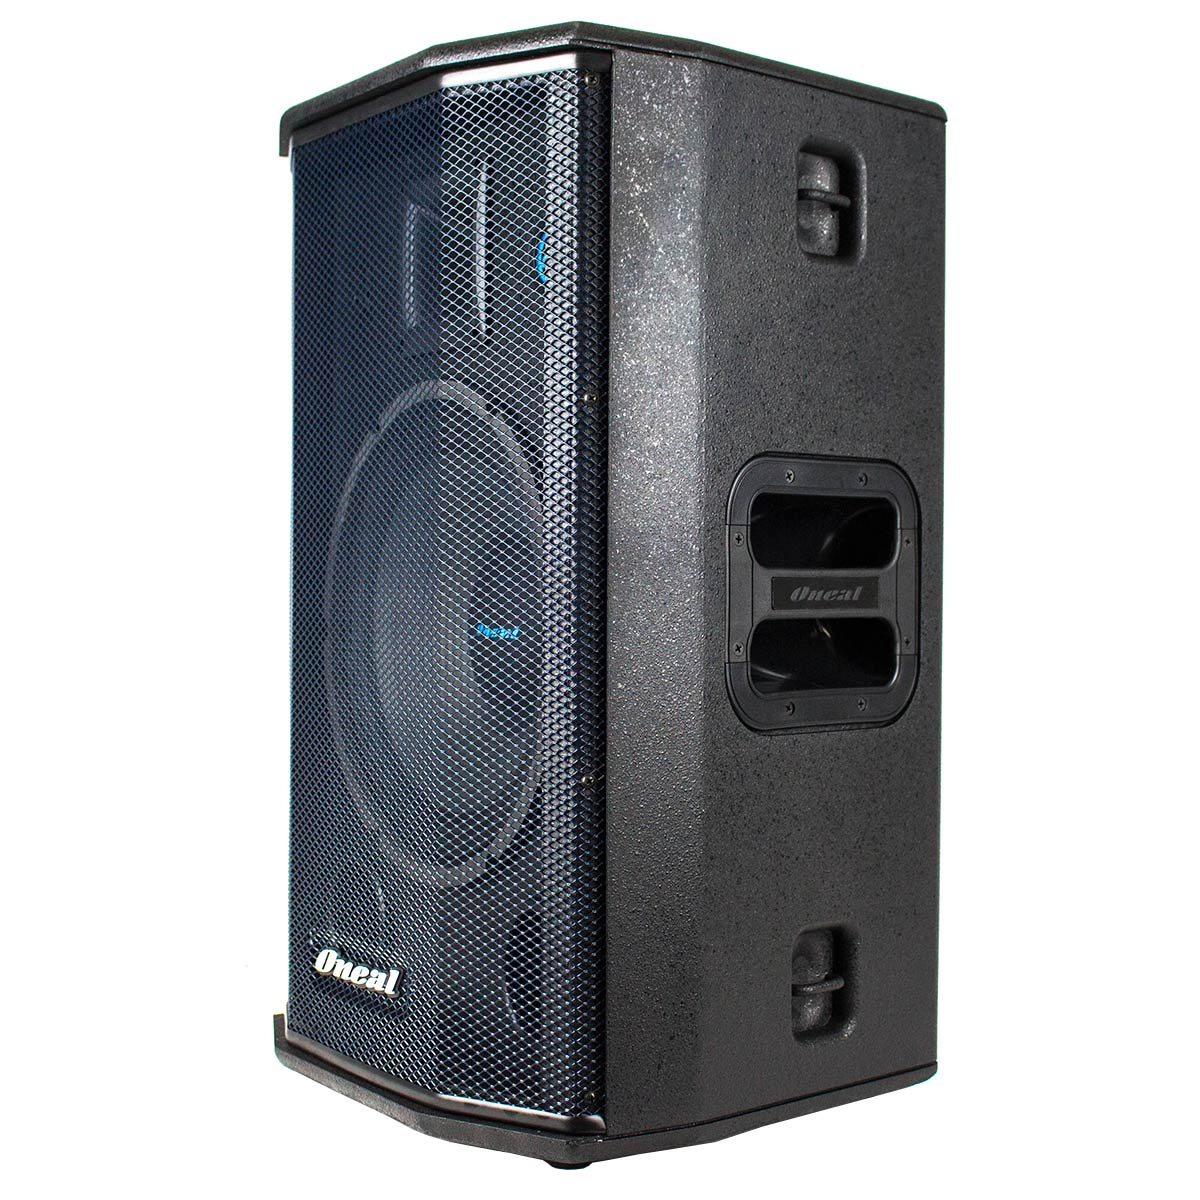 Caixa Ativa Fal 12 Pol 450W c/ USB / Bluetooth - OPB 1850 Oneal